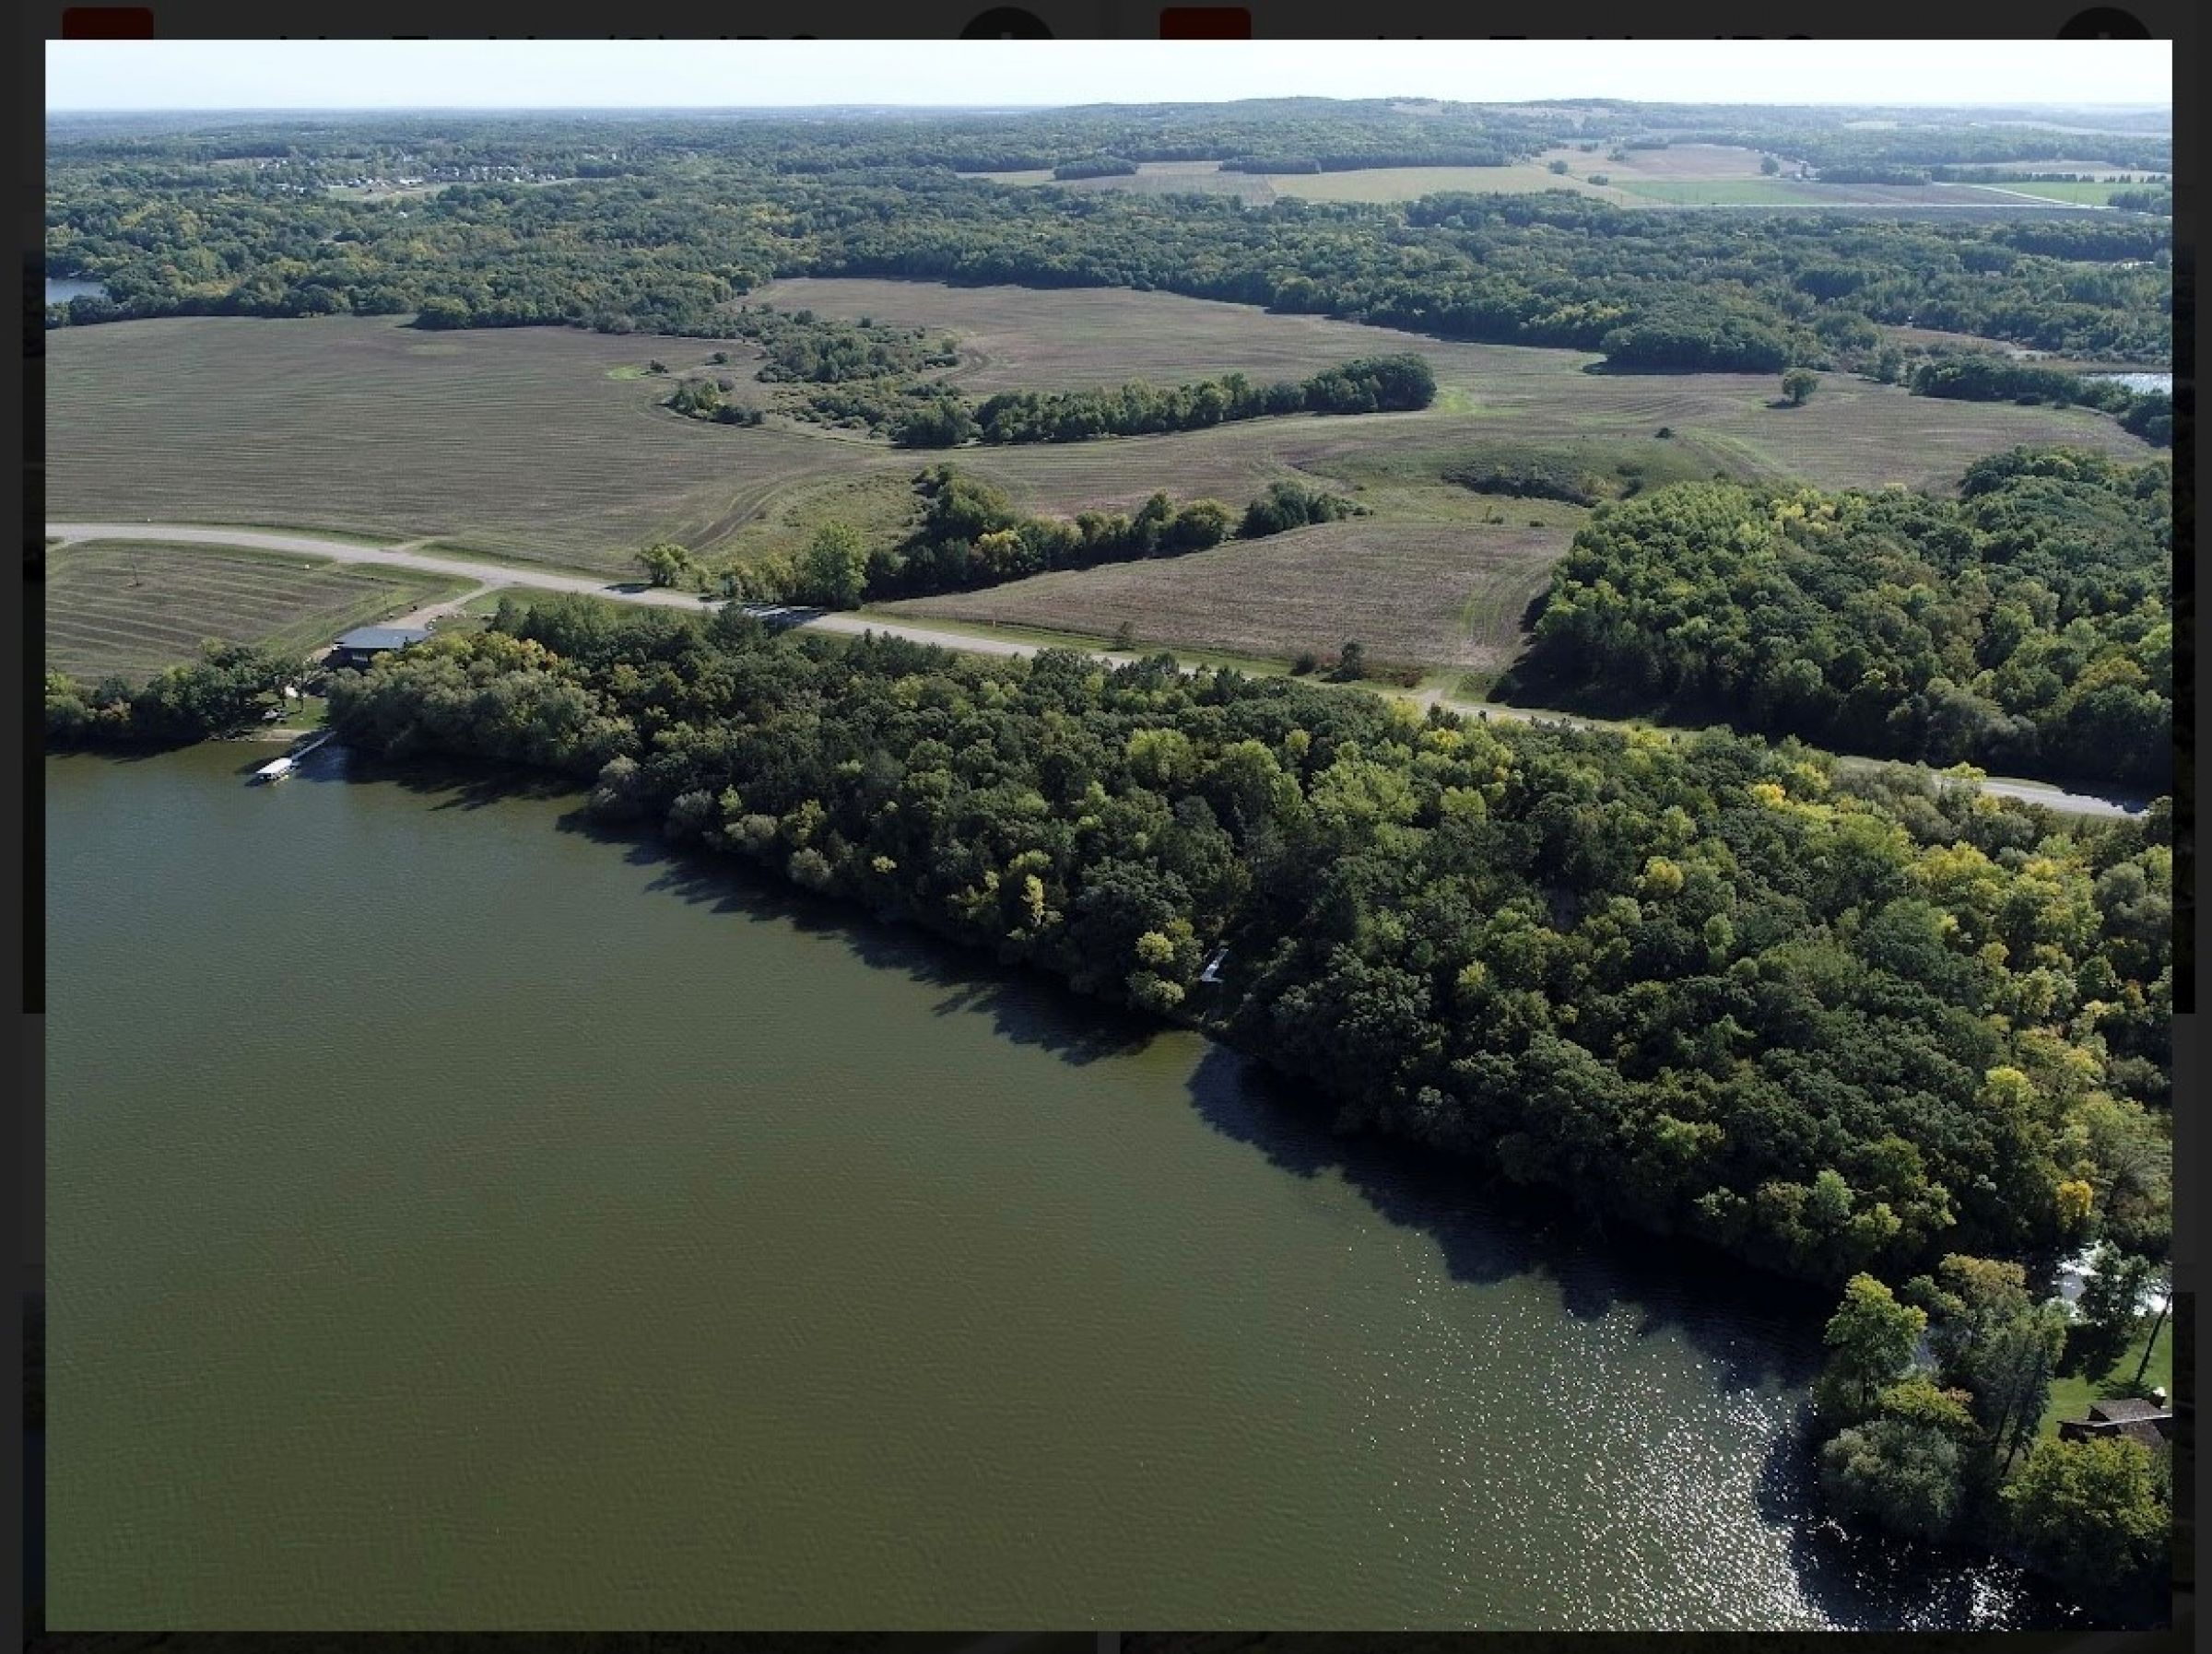 land-stearns-county-minnesota-298-acres-listing-number-15712-0-2021-09-23-122314.jpg